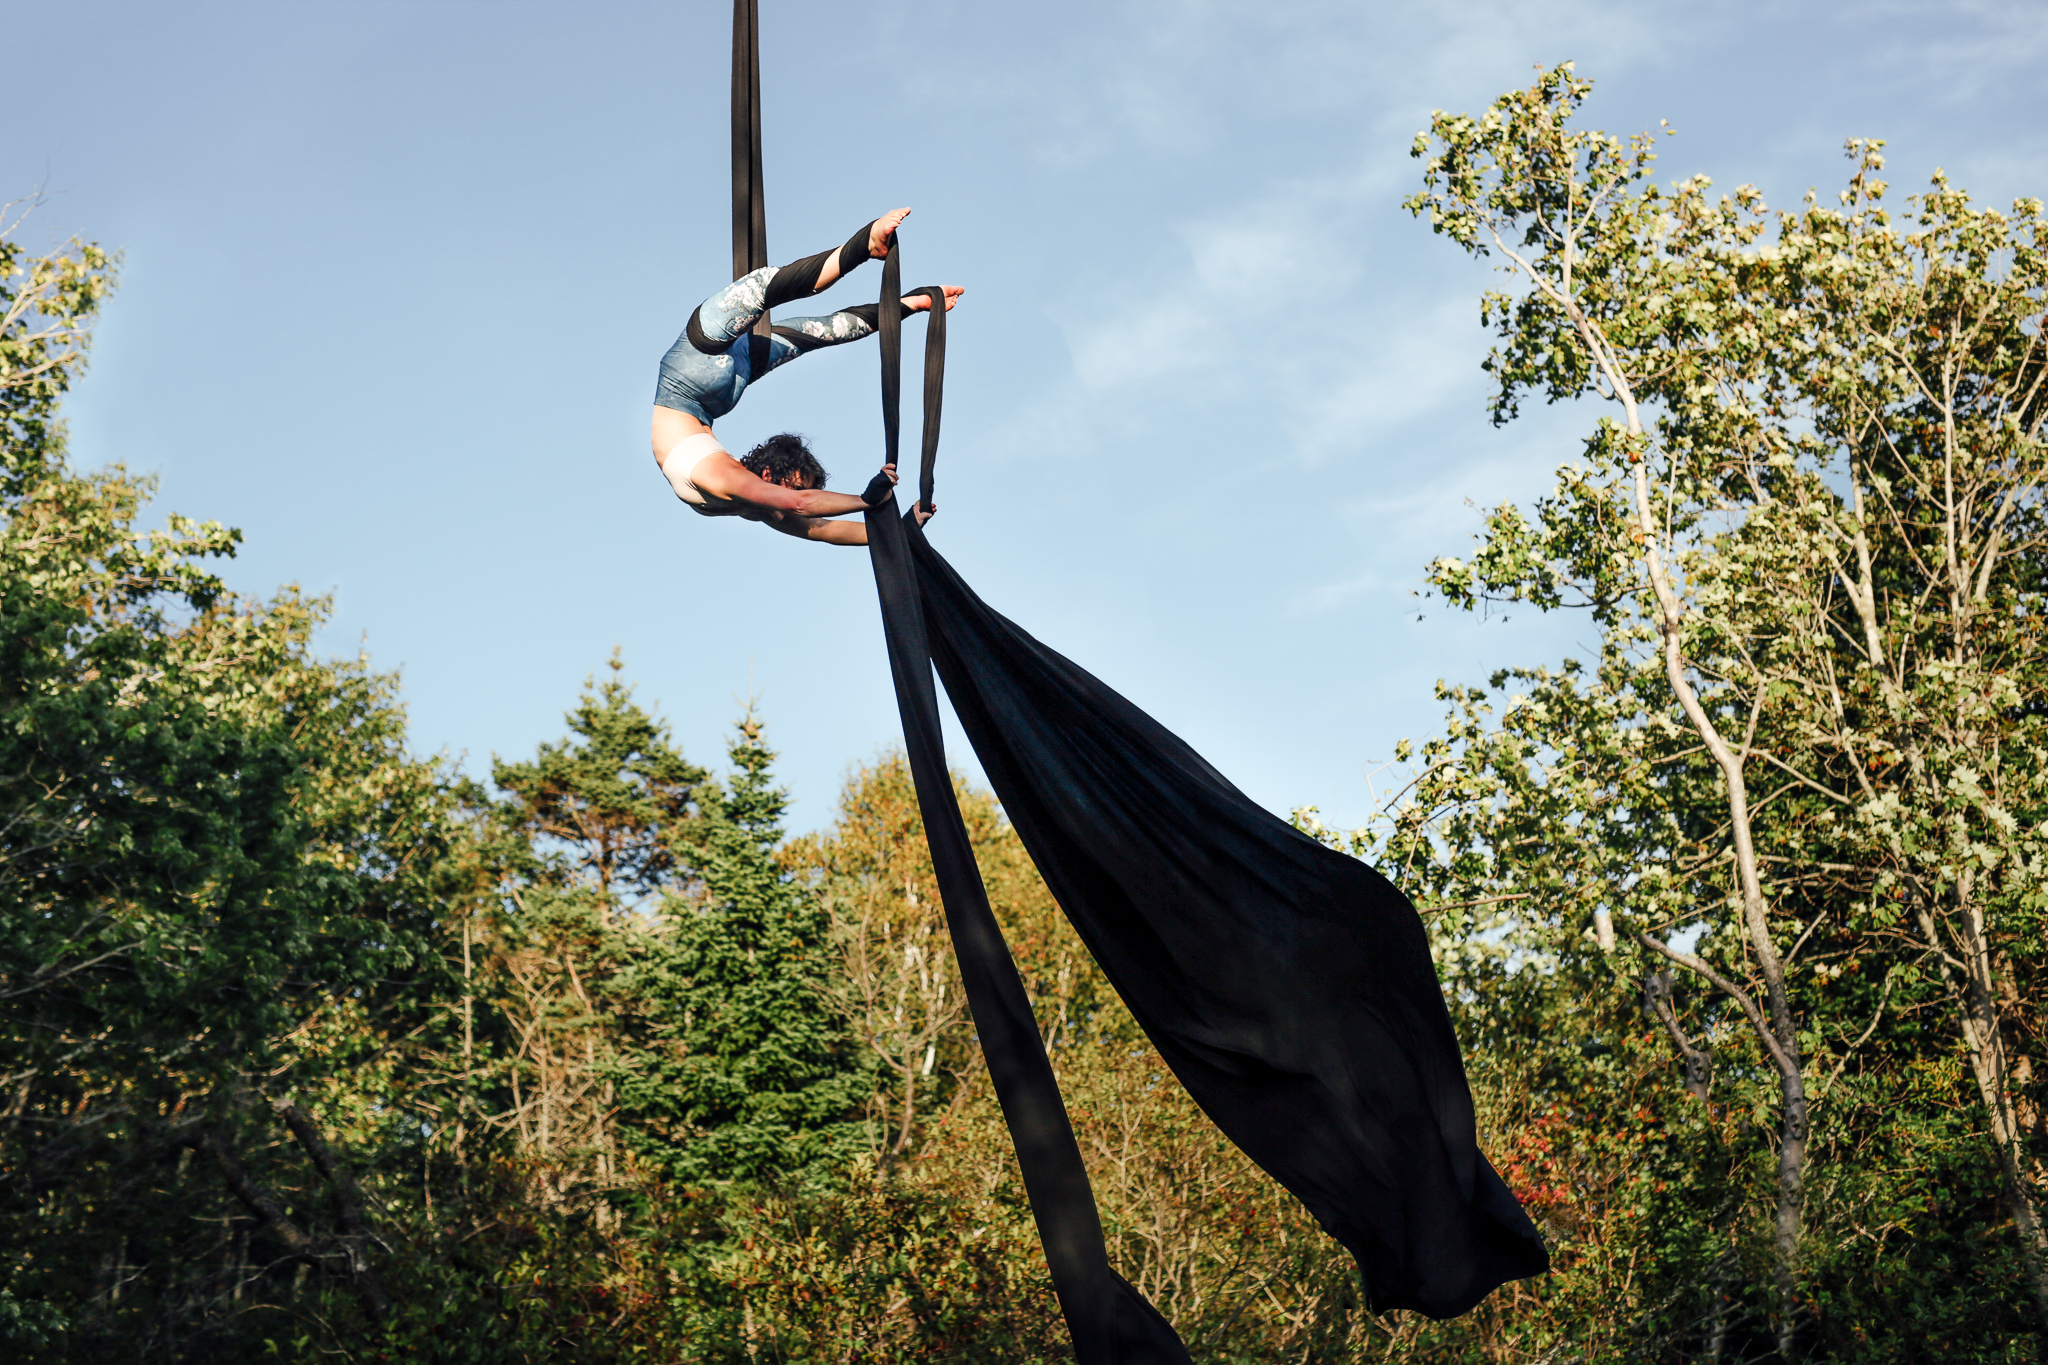 "Circus performer Angela Jackson trains on aerial silks in Halifax, Nova Scotia, Canada. (Photo by Lyndsay Doyle)"""